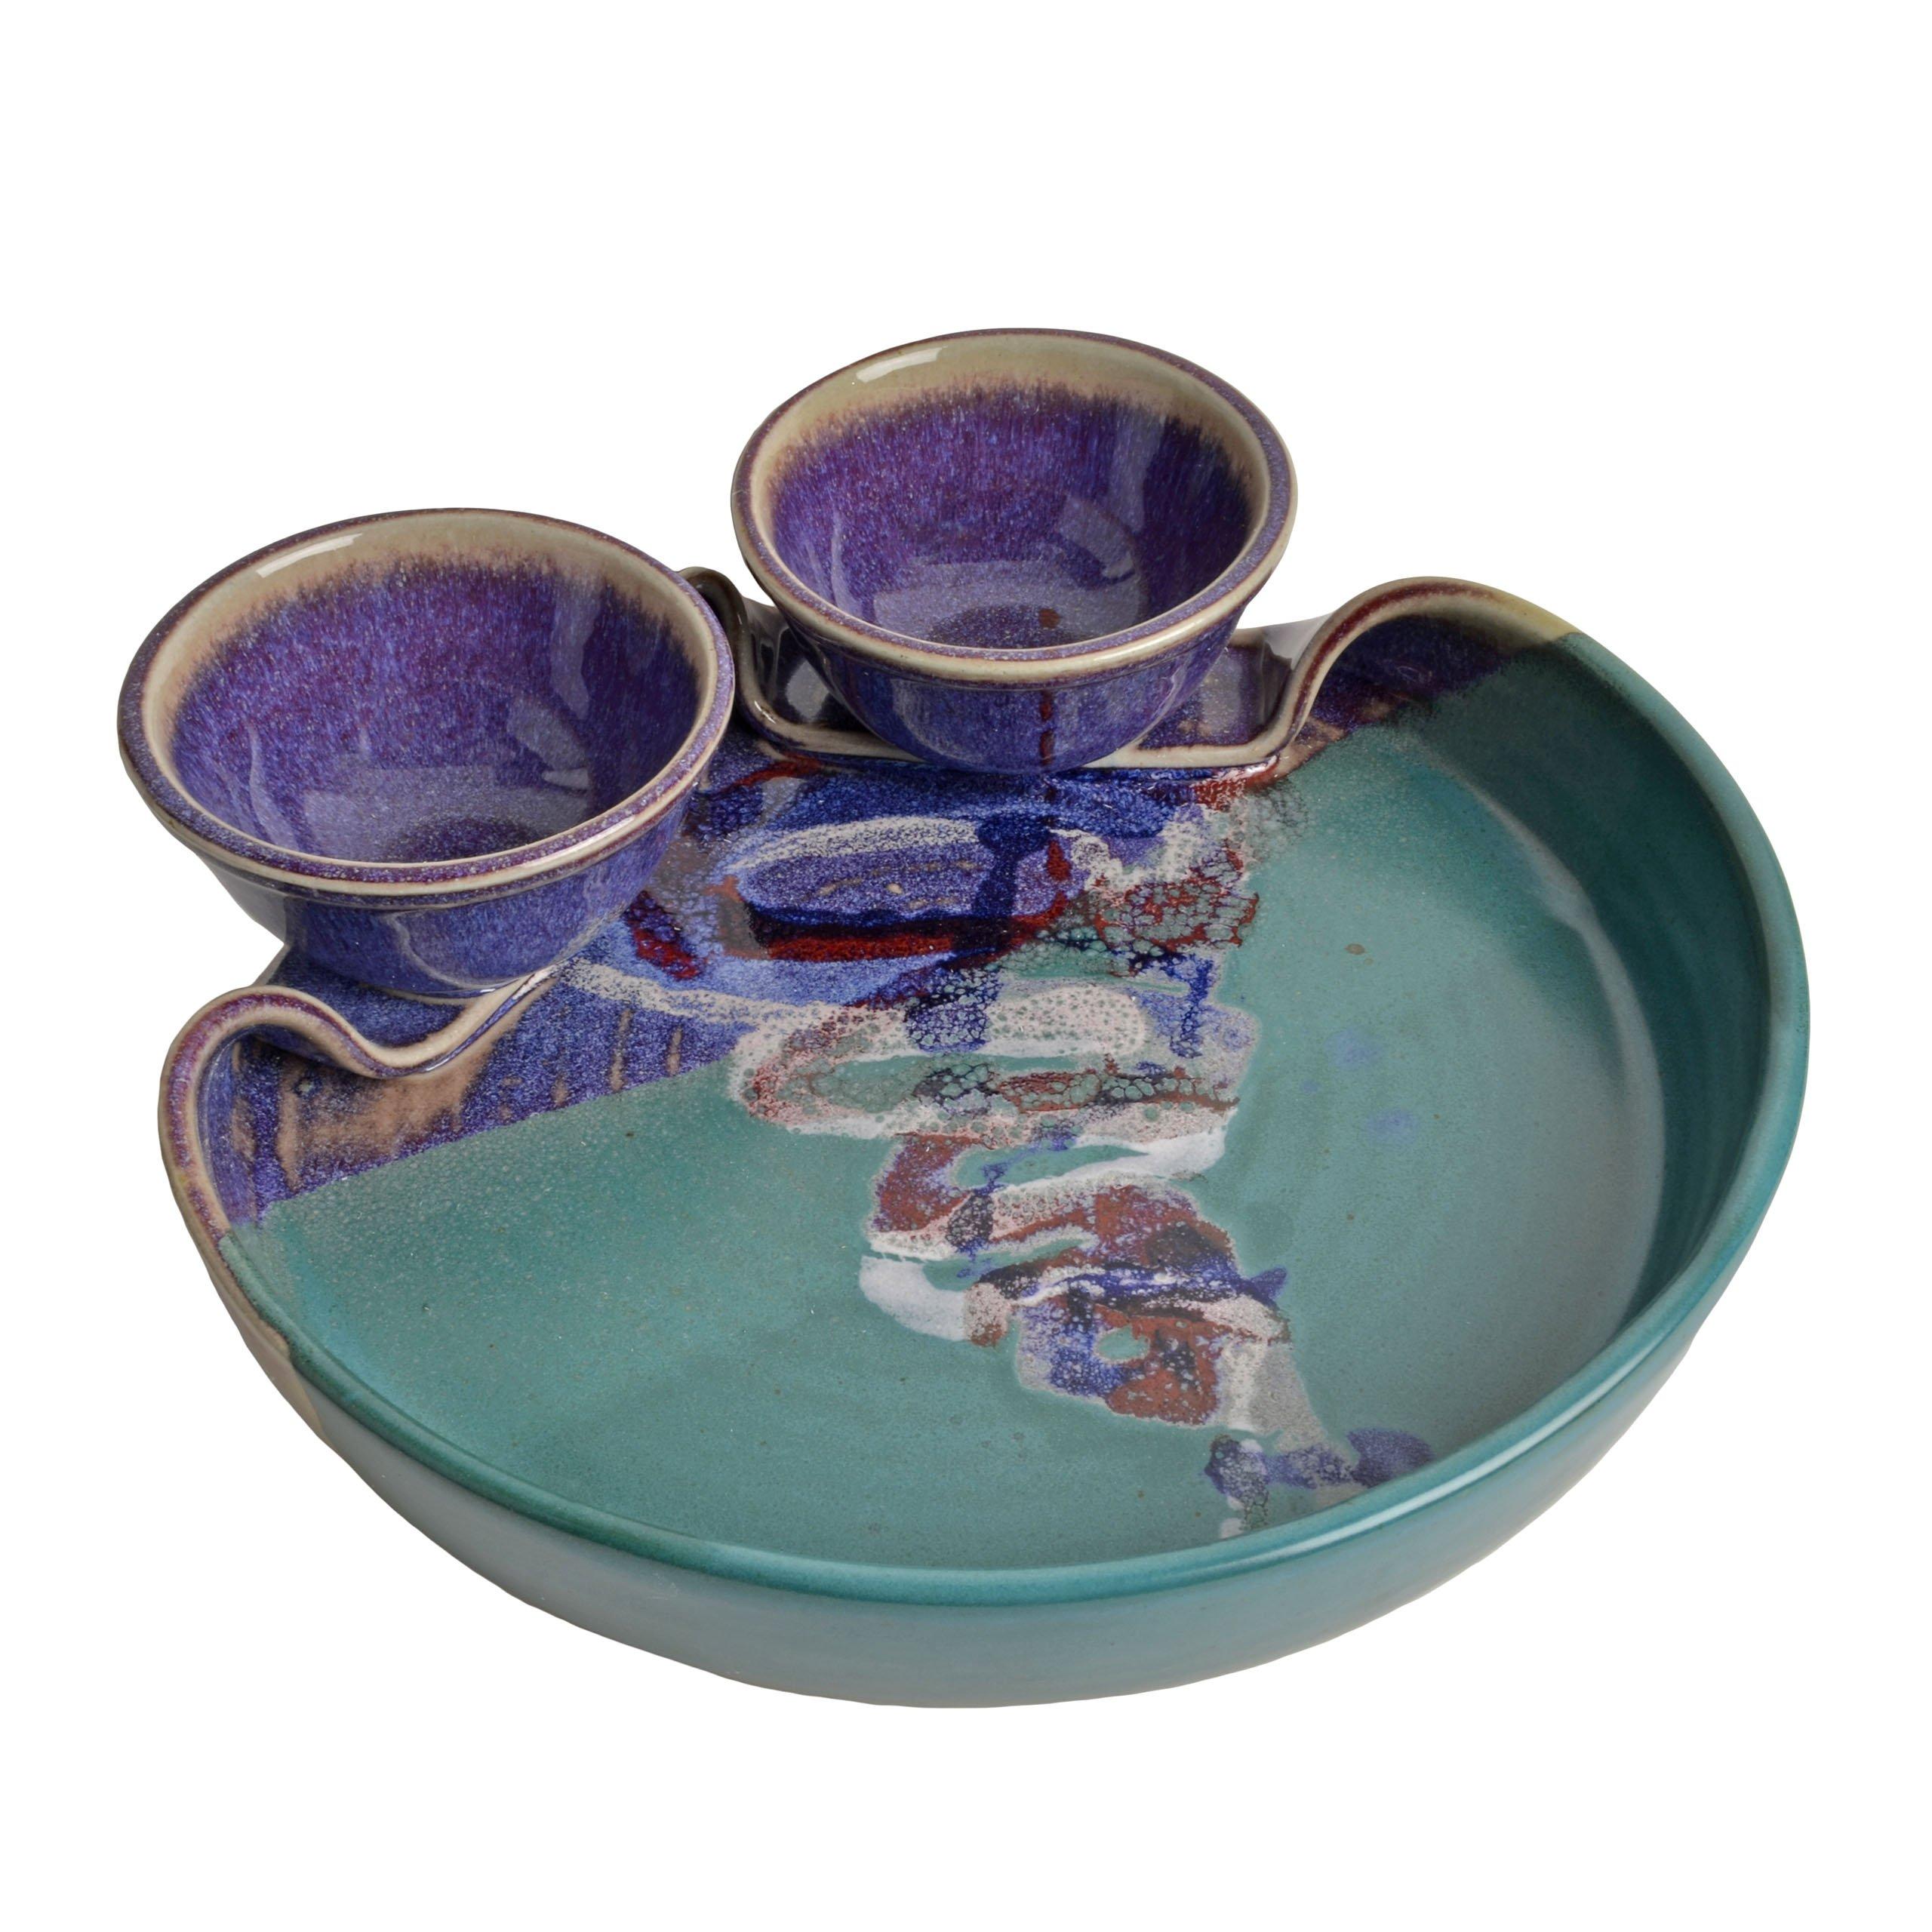 Larrabee Ceramics Double Bowl Chip and Dip Platter, Mauve/Green